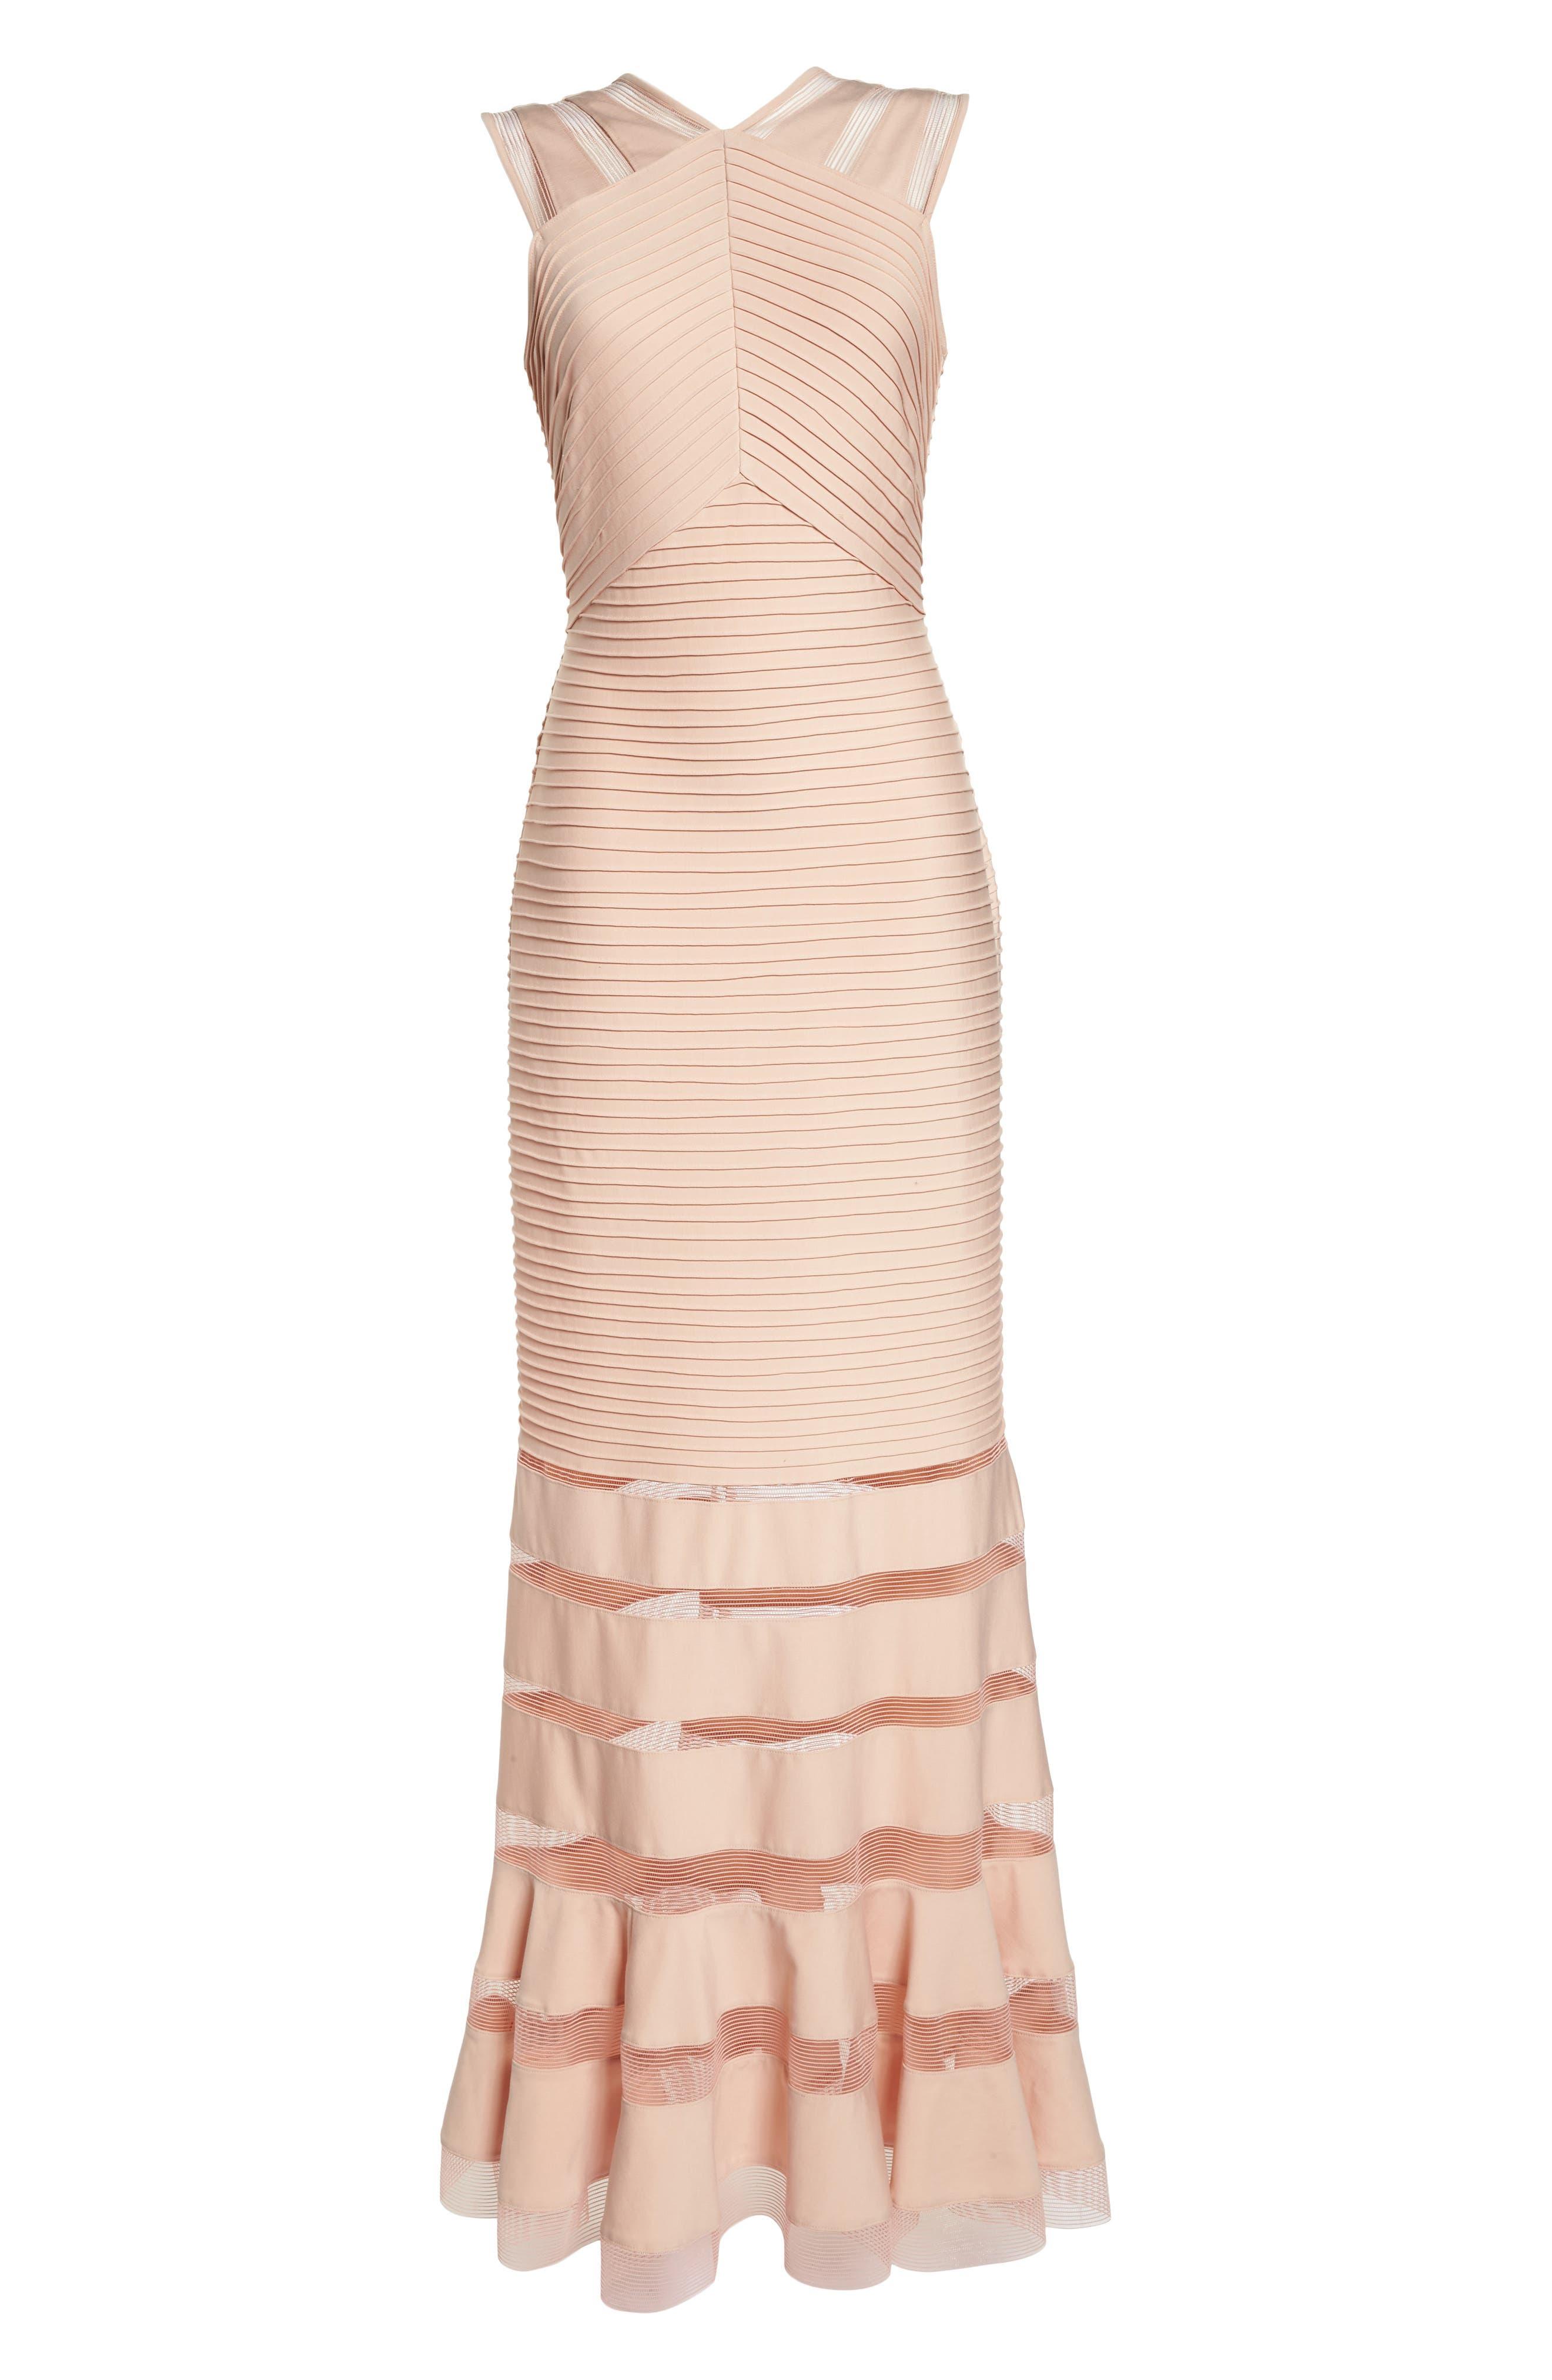 Mesh Inset Pintuck Dress,                             Alternate thumbnail 6, color,                             PETAL/ BLOOM